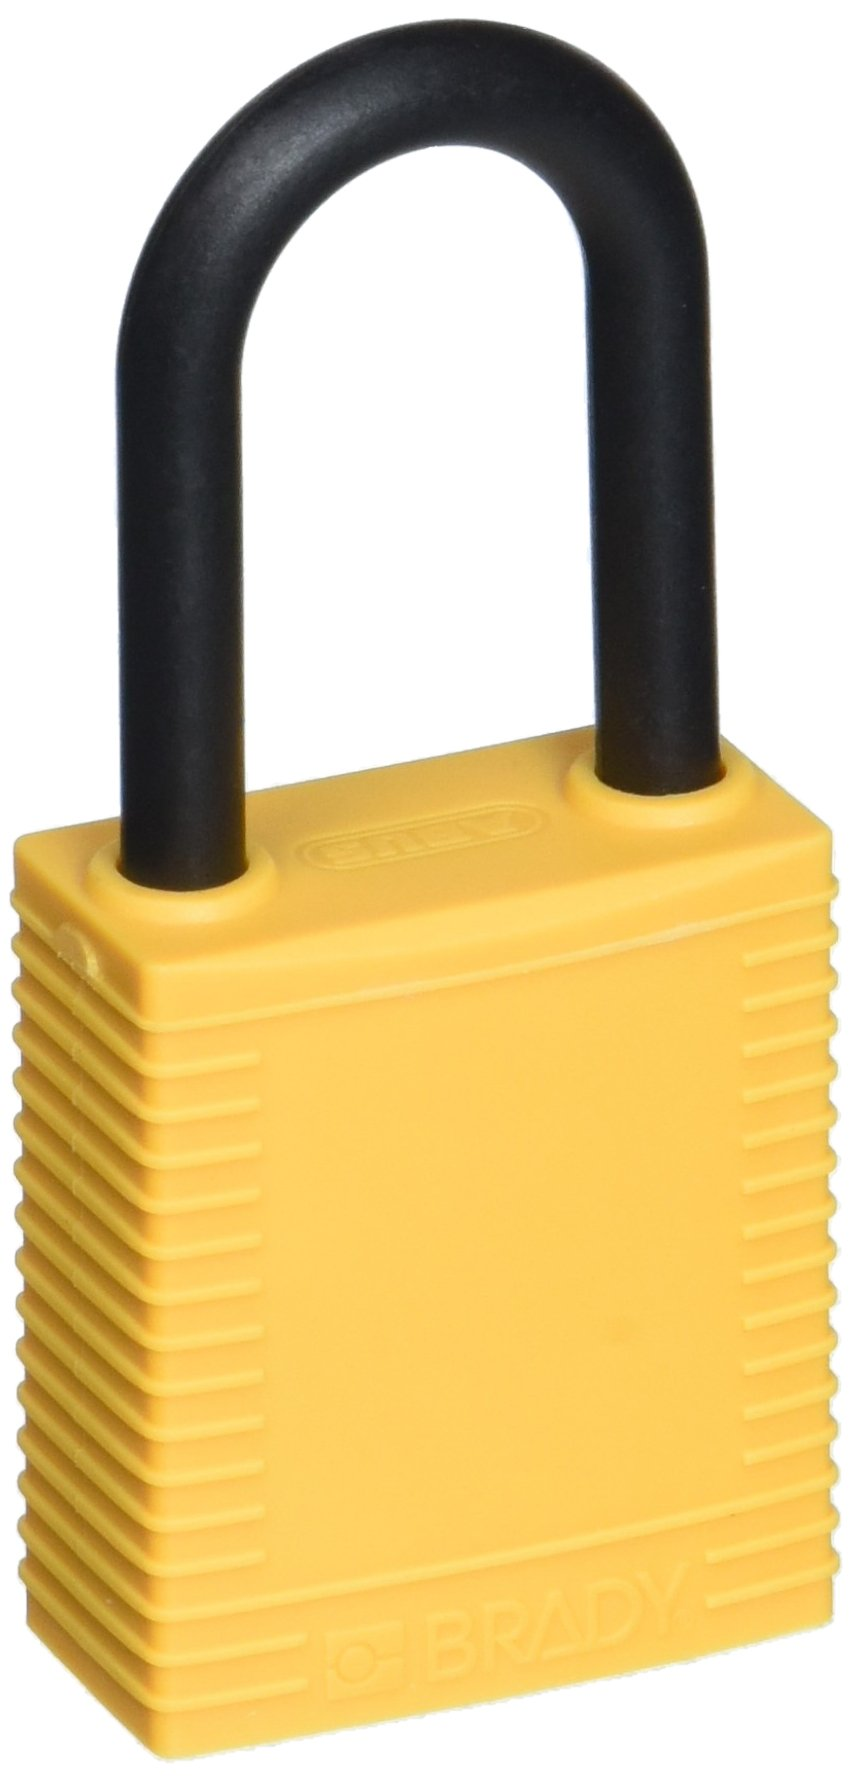 Brady 123345''Danger Locked Out DO NOT Remove'' Padlock, Nylon Plastic, Yellow (Pack of 6)